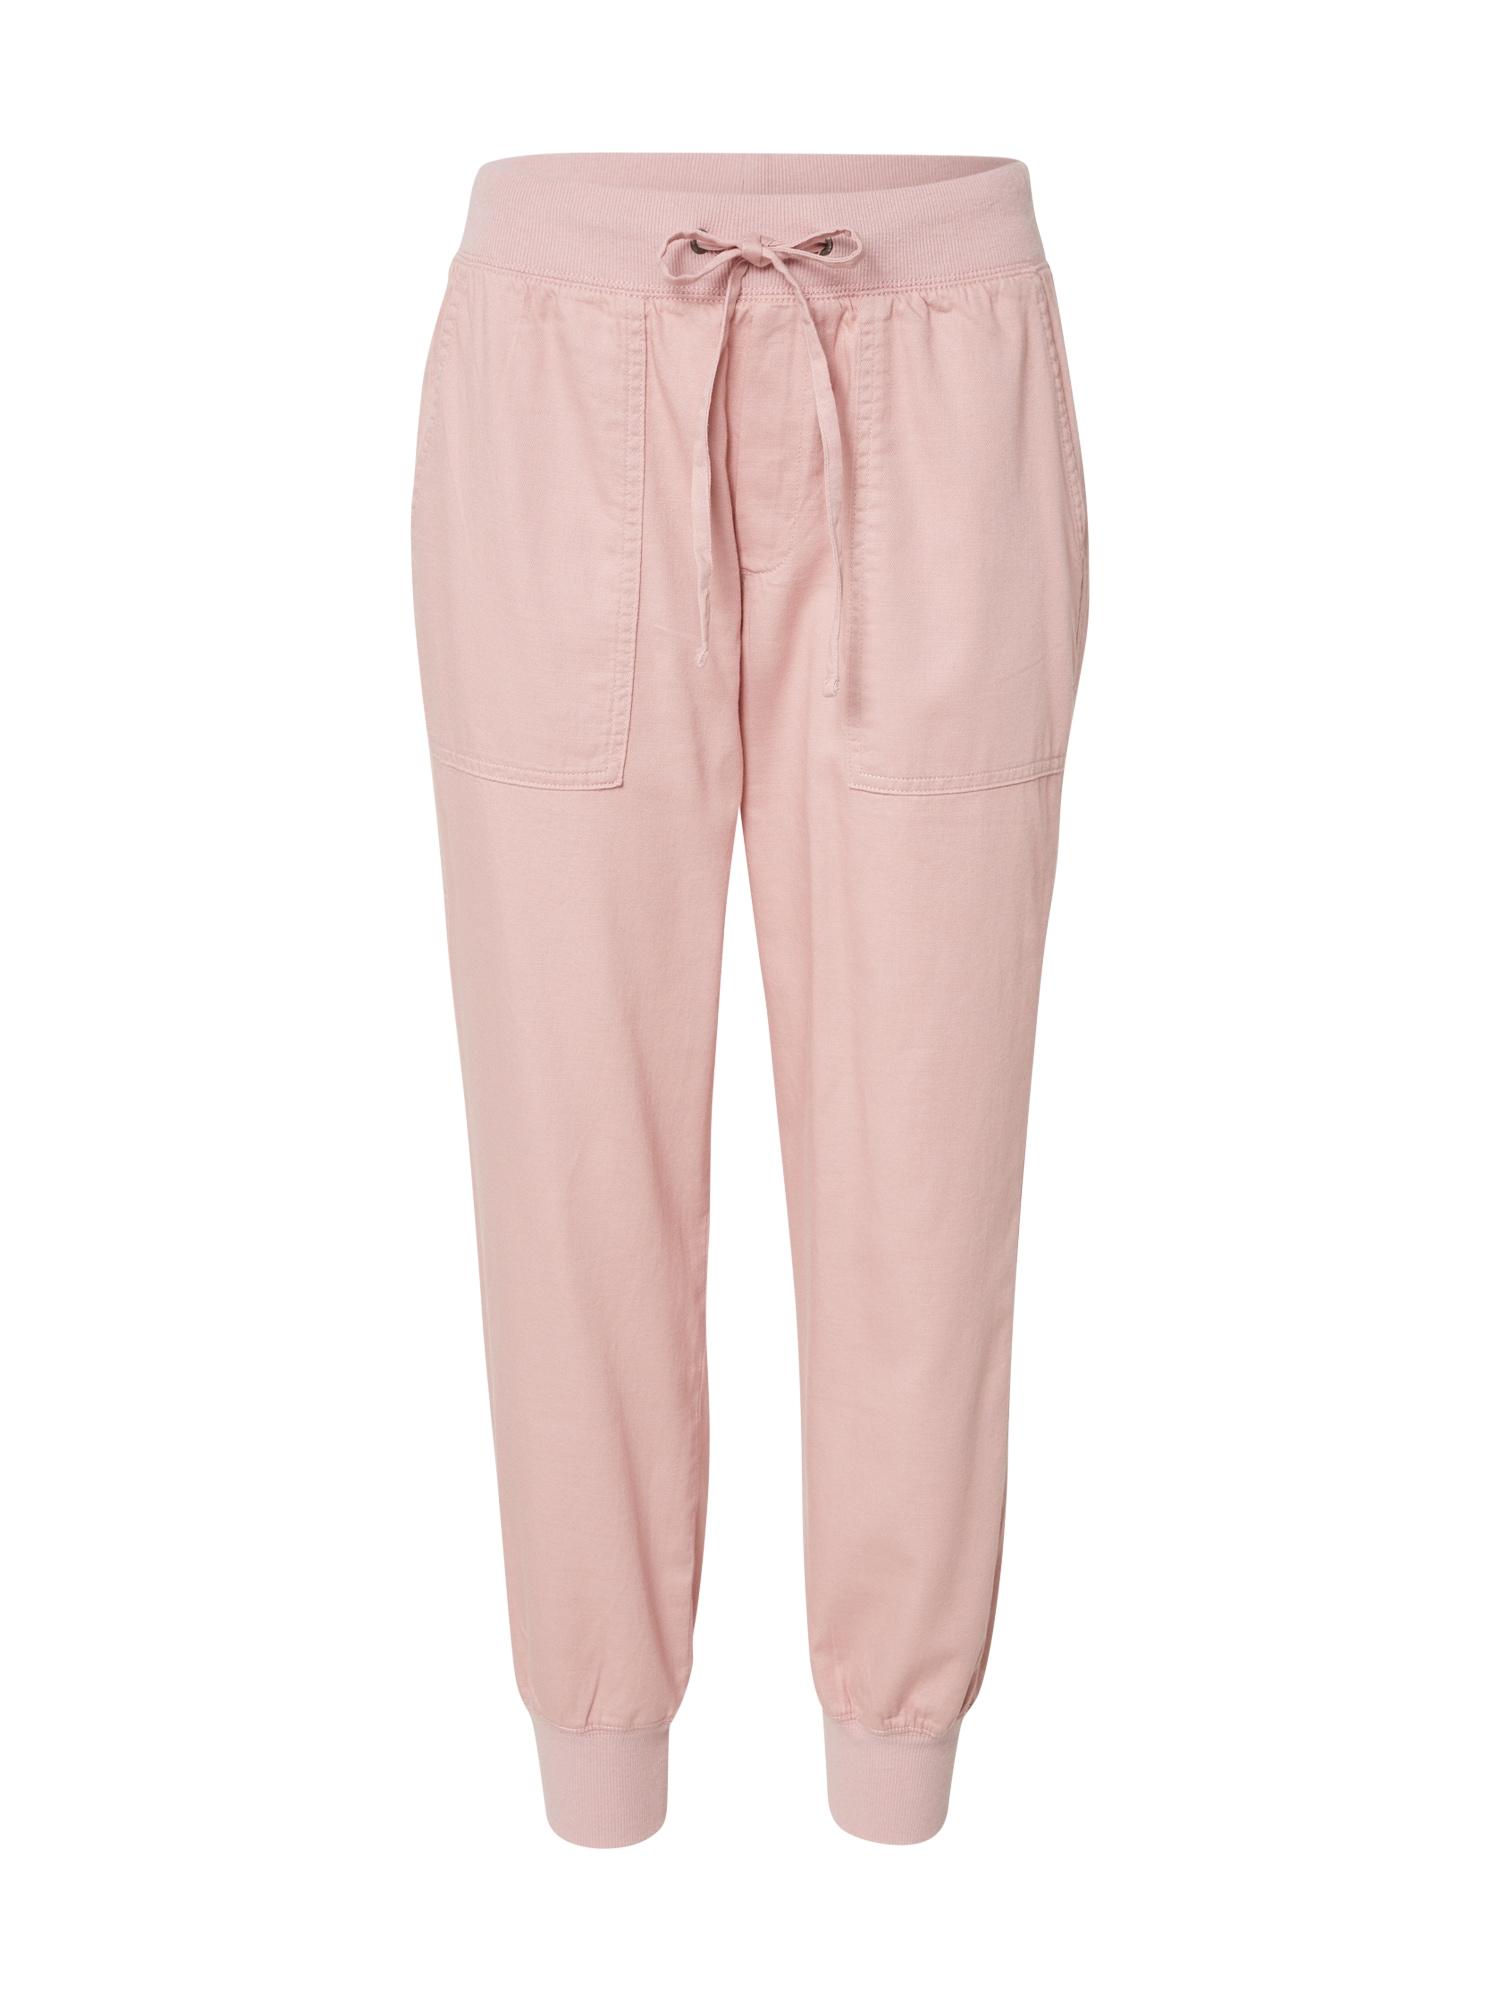 GAP Kelnės 'V-RIB UTILITY JOGGER' rožinė